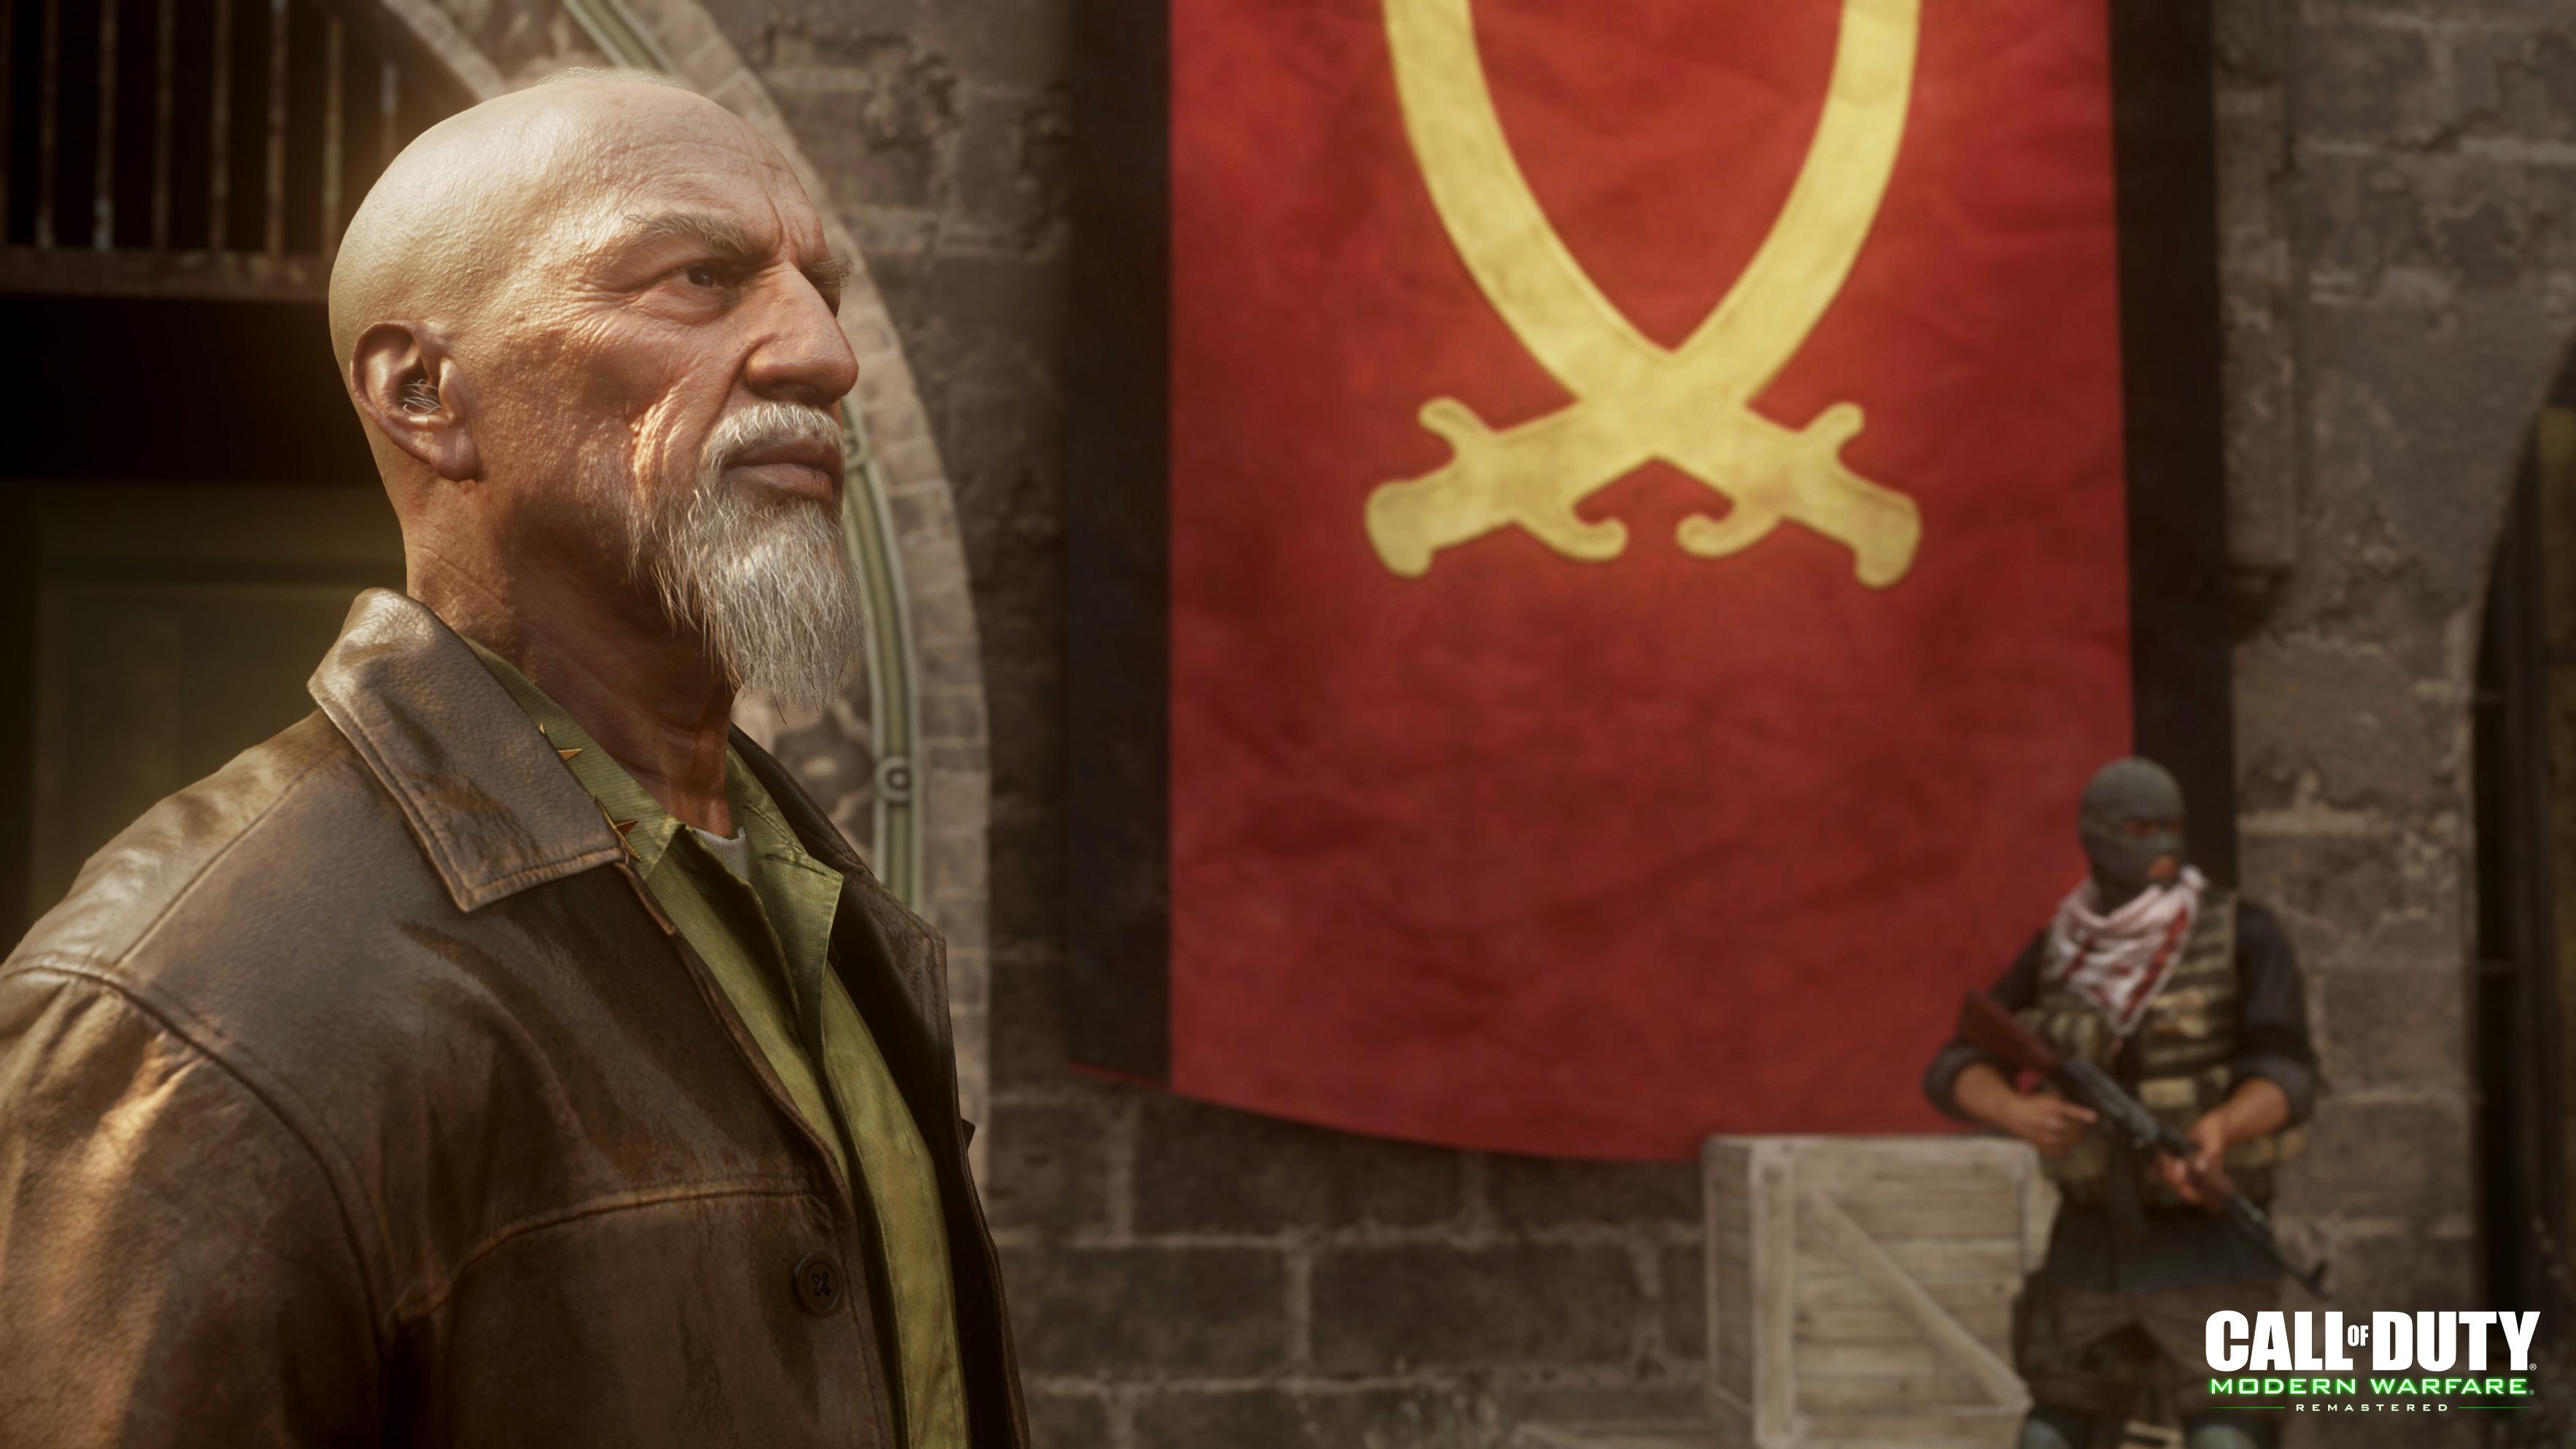 Evgeniy Lazarev in Call of Duty: Modern Warfare Remastered (2016)